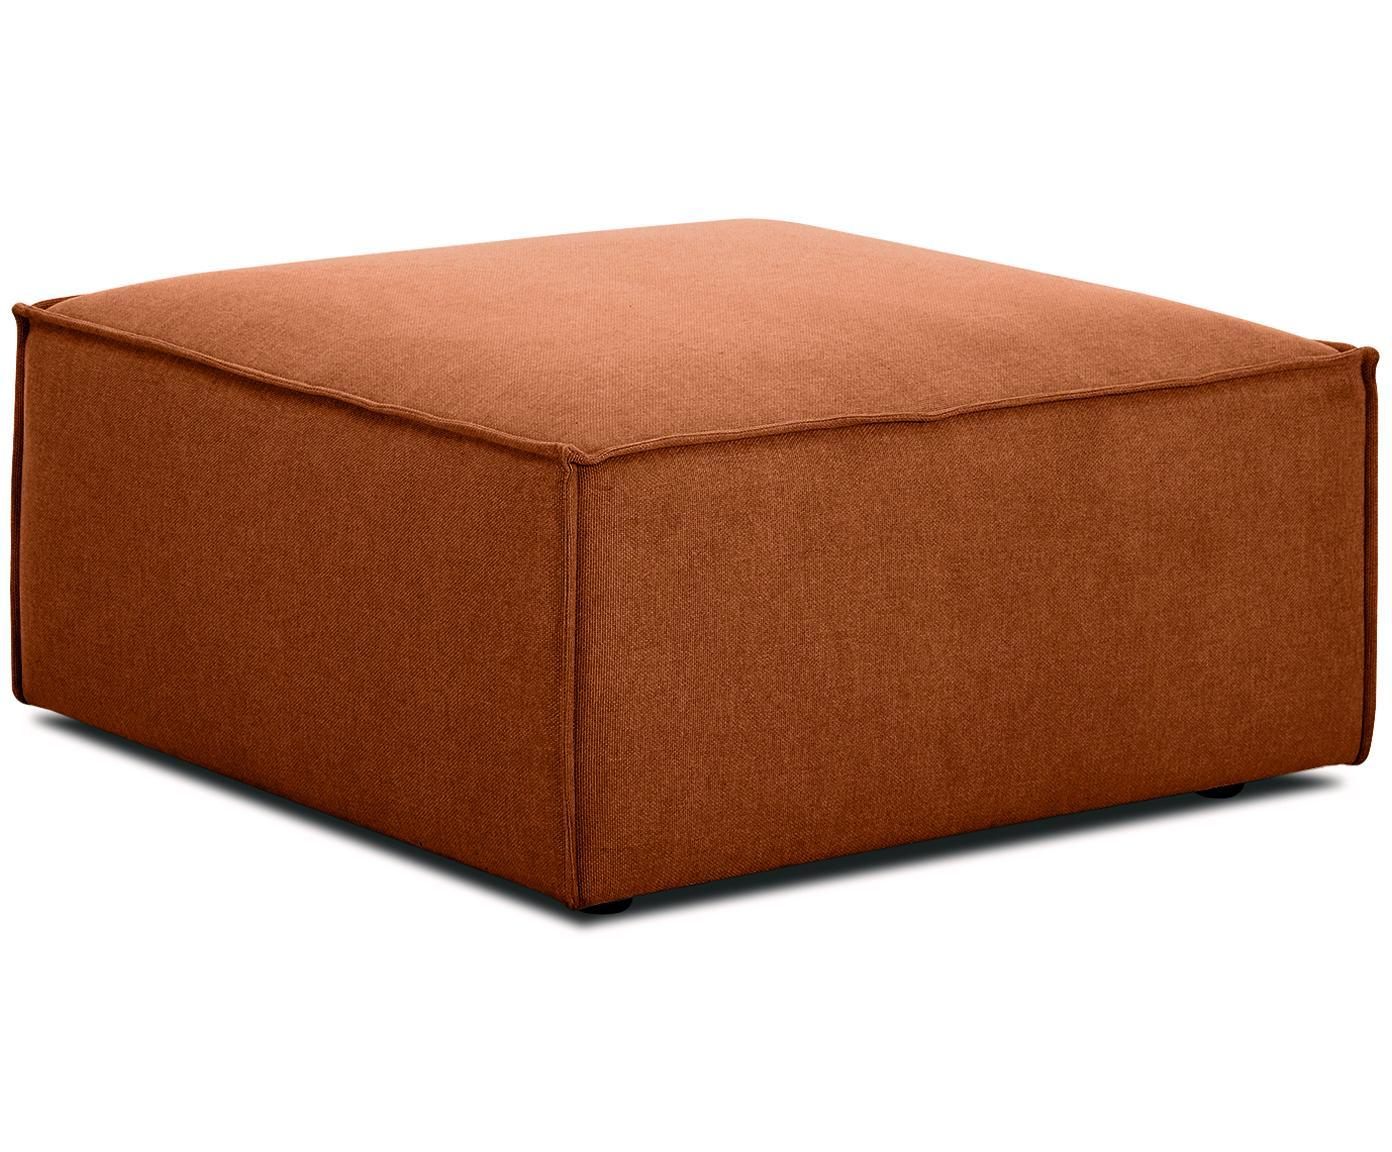 Sofa-Hocker Lennon, Bezug: Polyester 35.000 Scheuert, Gestell: Massives Kiefernholz, Spe, Webstoff Terrakotta, 88 x 43 cm